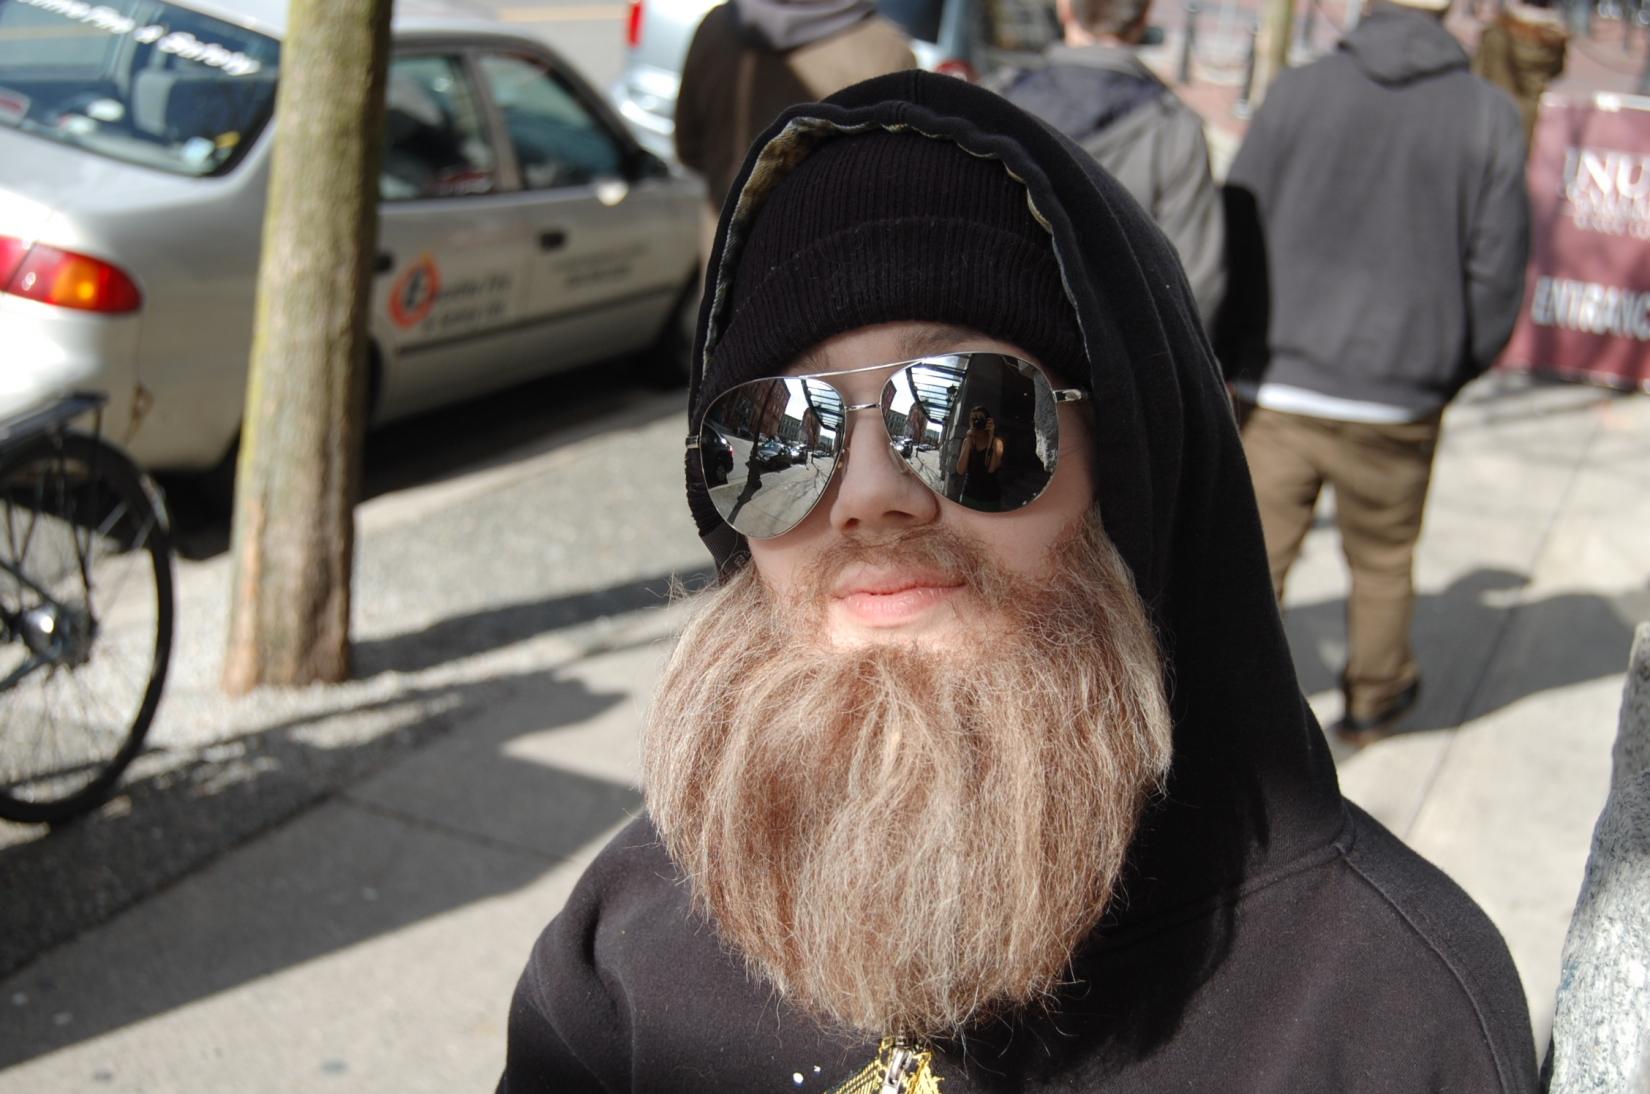 Make Up by ASM - Fake long beard